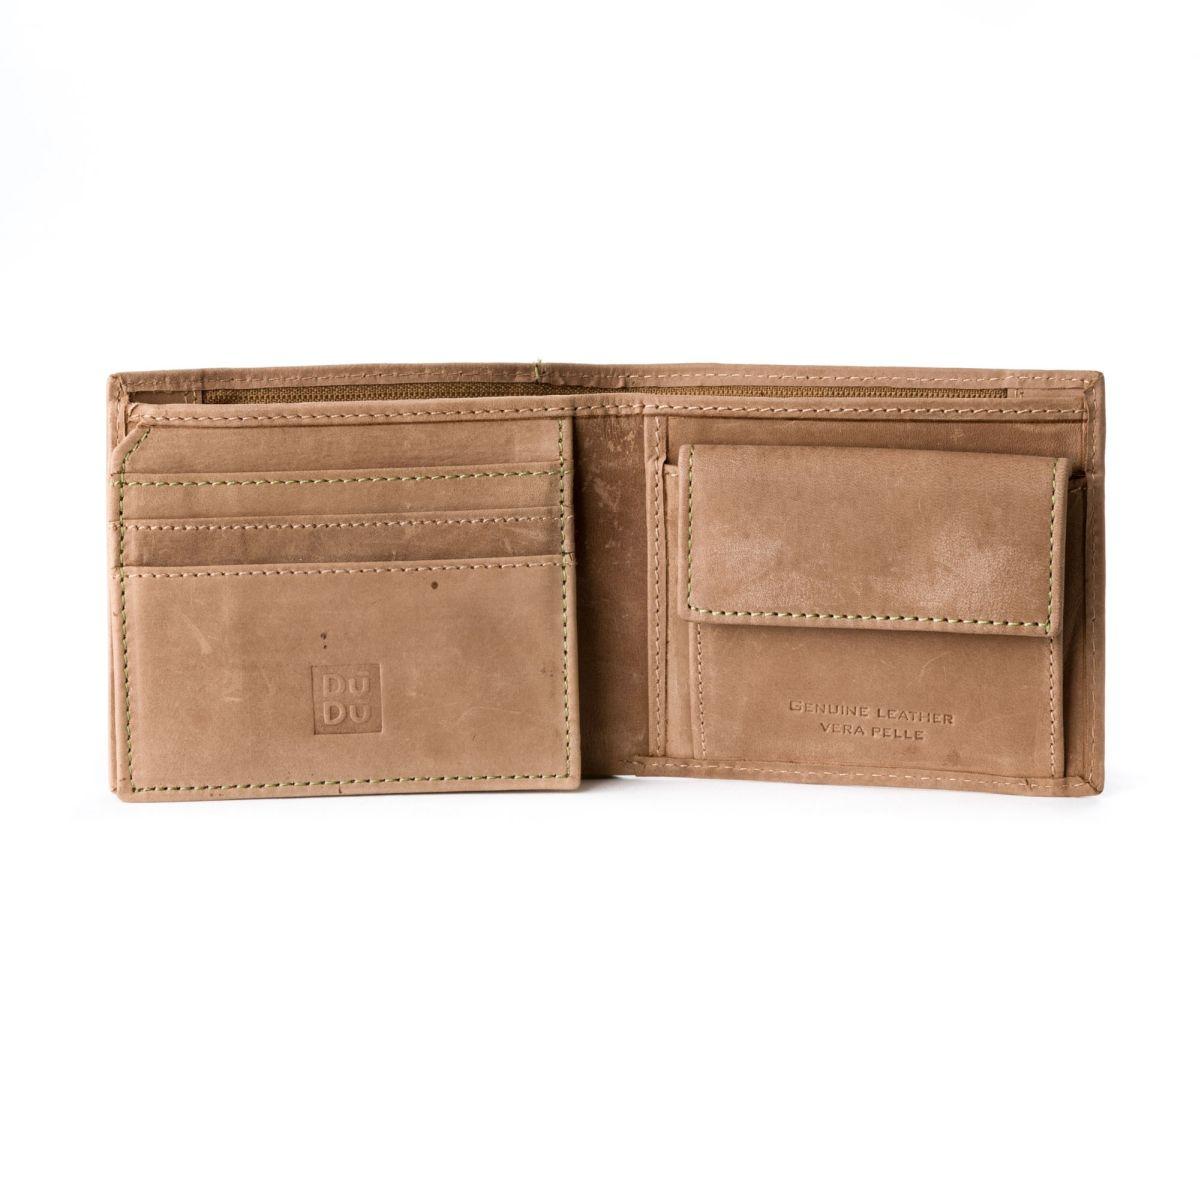 DuDu Mans vintage leather wallet - Tan